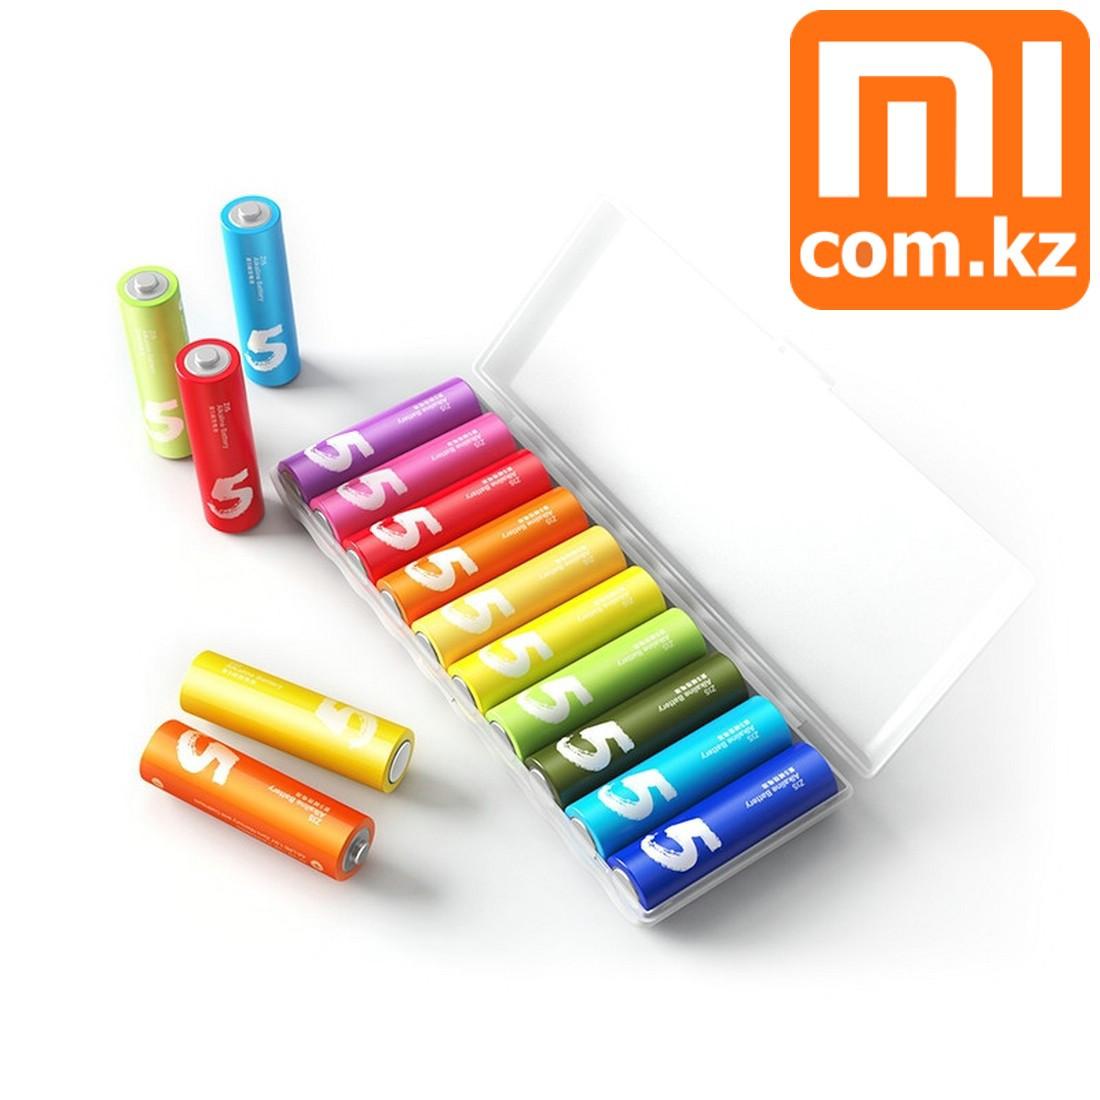 Батарейки Xiaomi Mi Rainbow AA, 10 шт, разноцветные